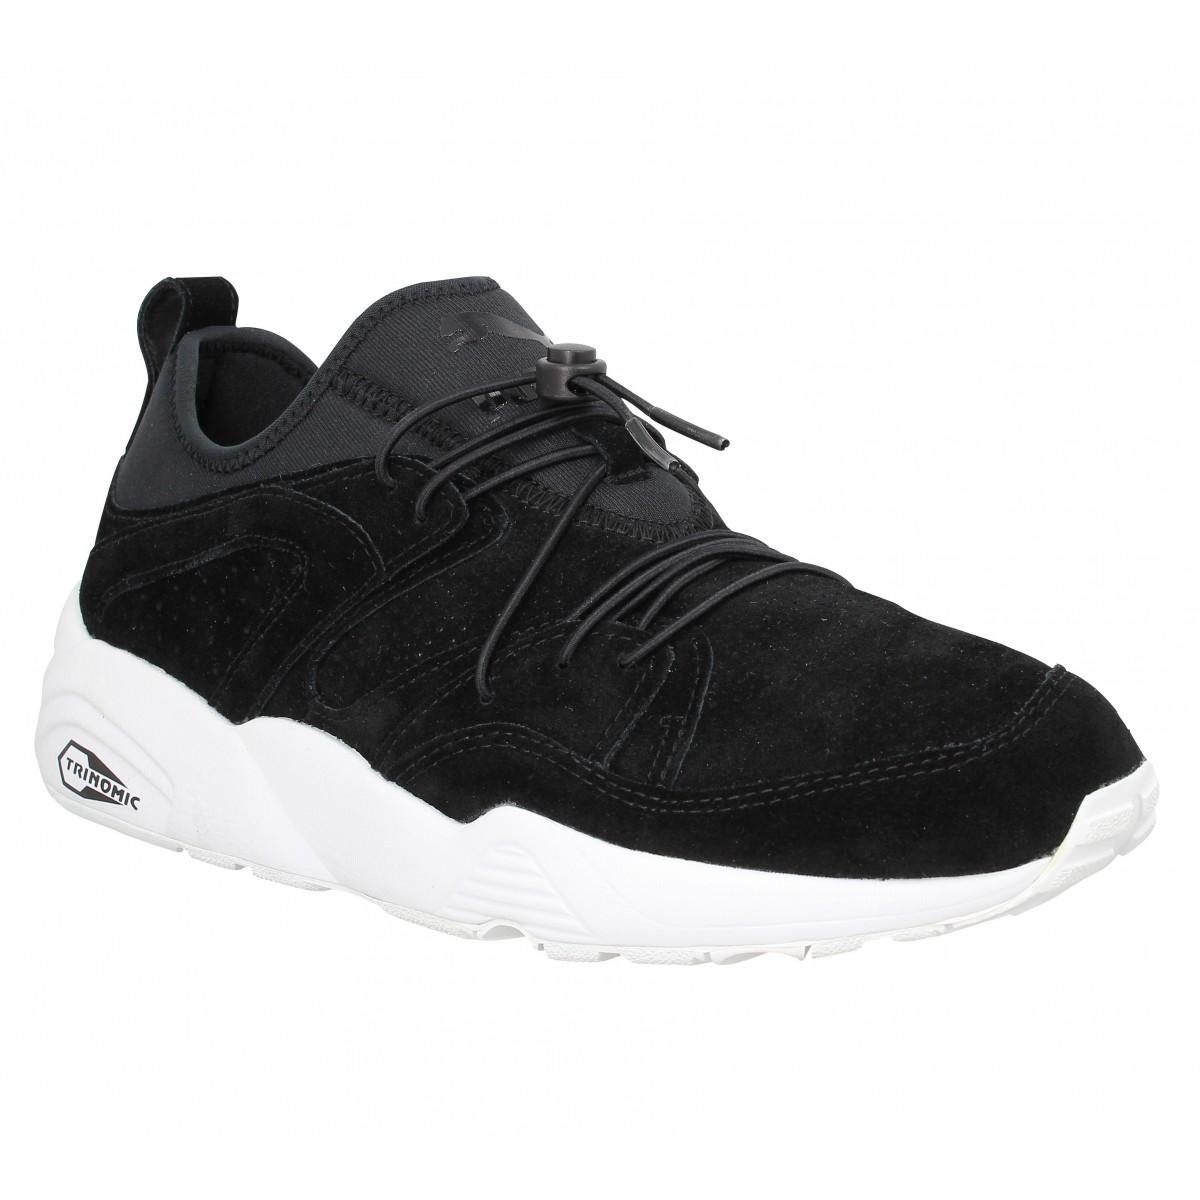 puma chaussure homme